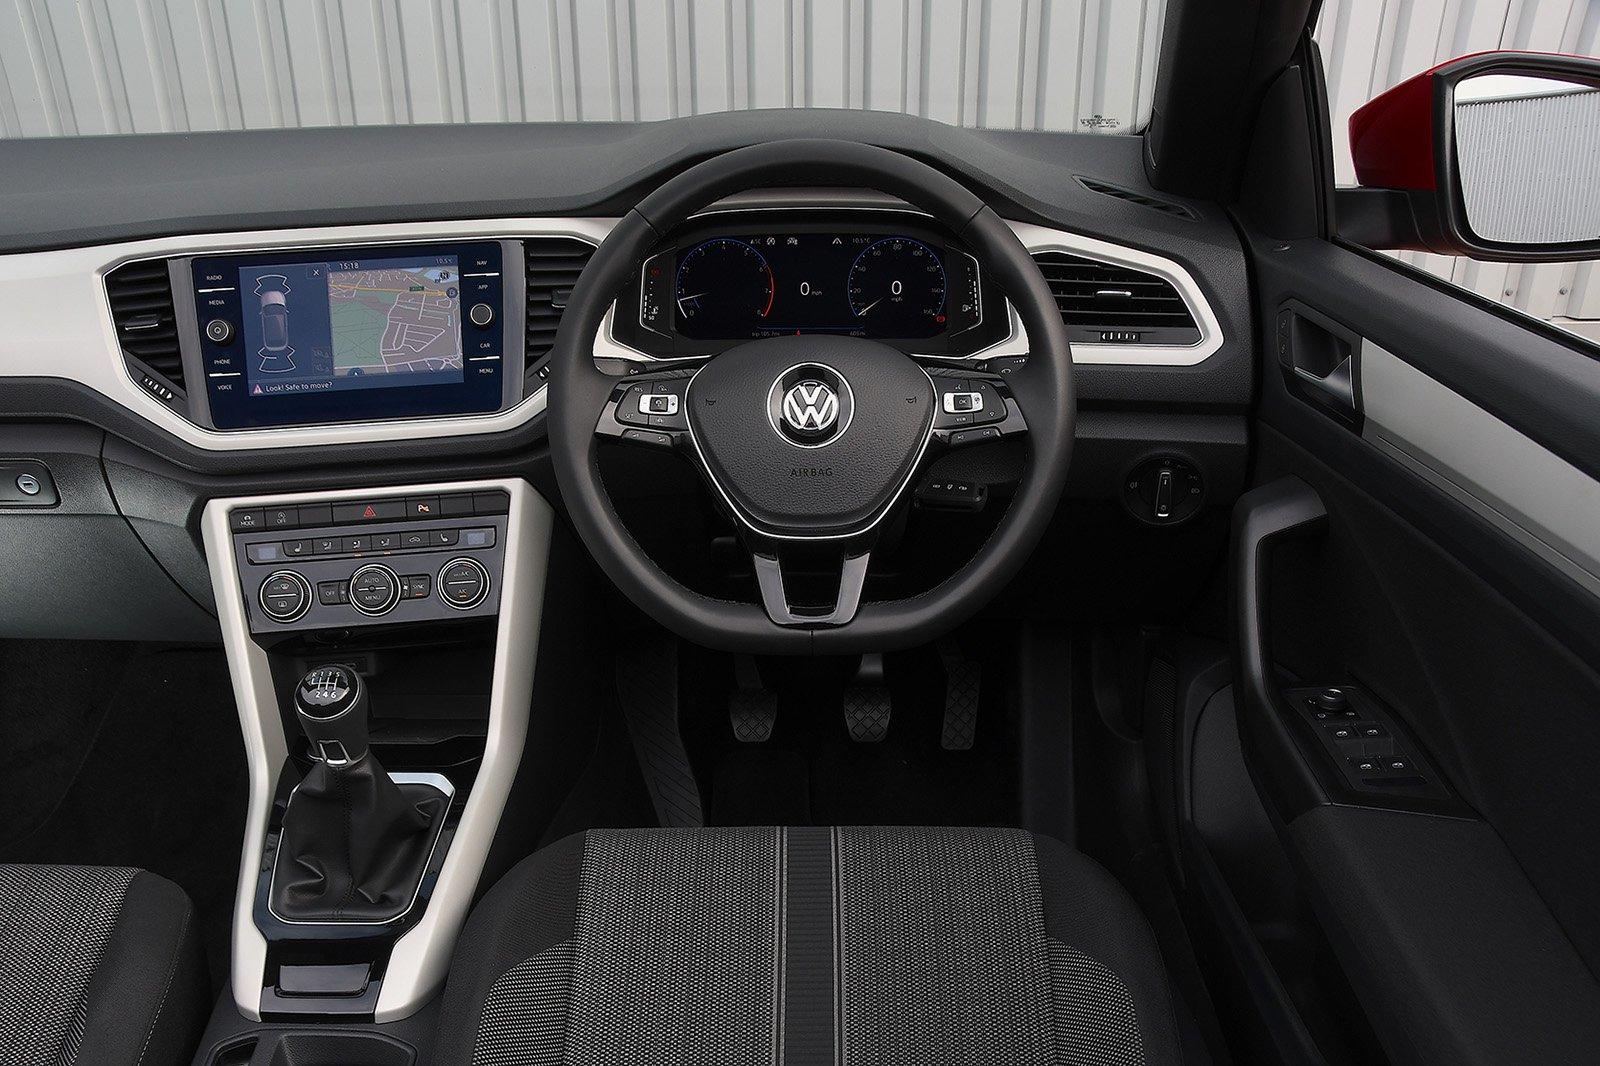 2020 Volkswagen T-Roc Cabriolet 1.5 TSI Design interior